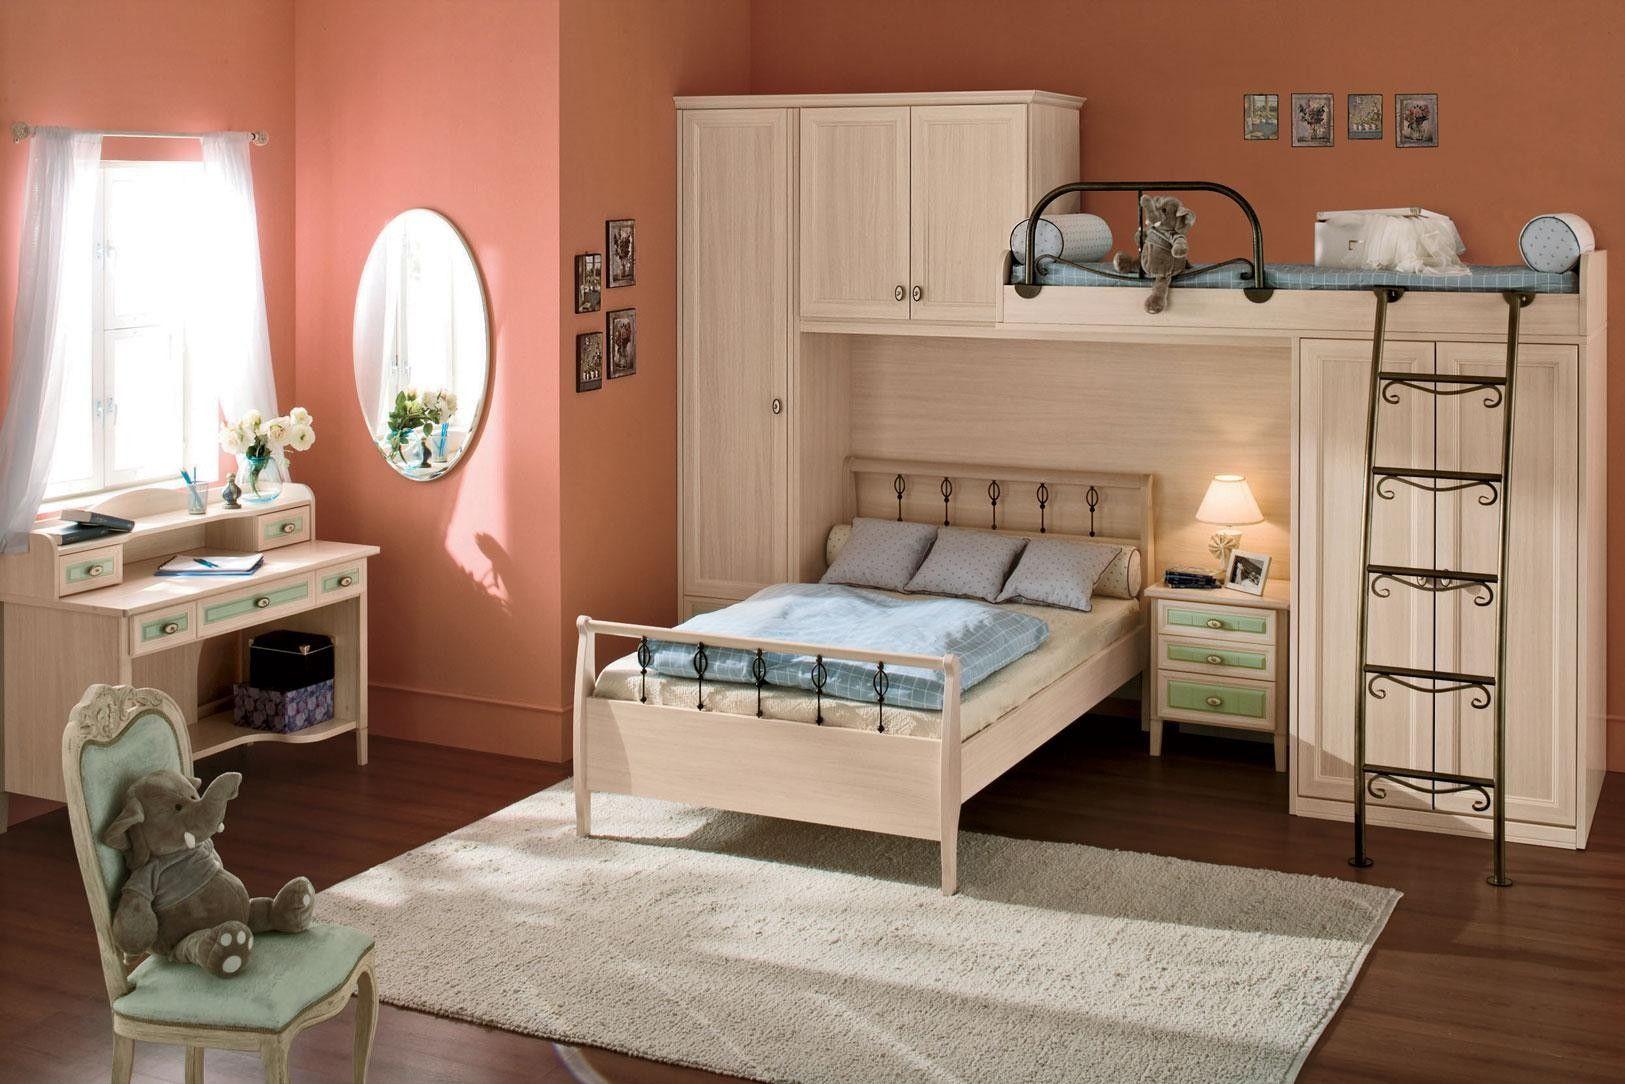 9 Best Ikea Childrens Bedroom Sets  Small room bedroom, Small